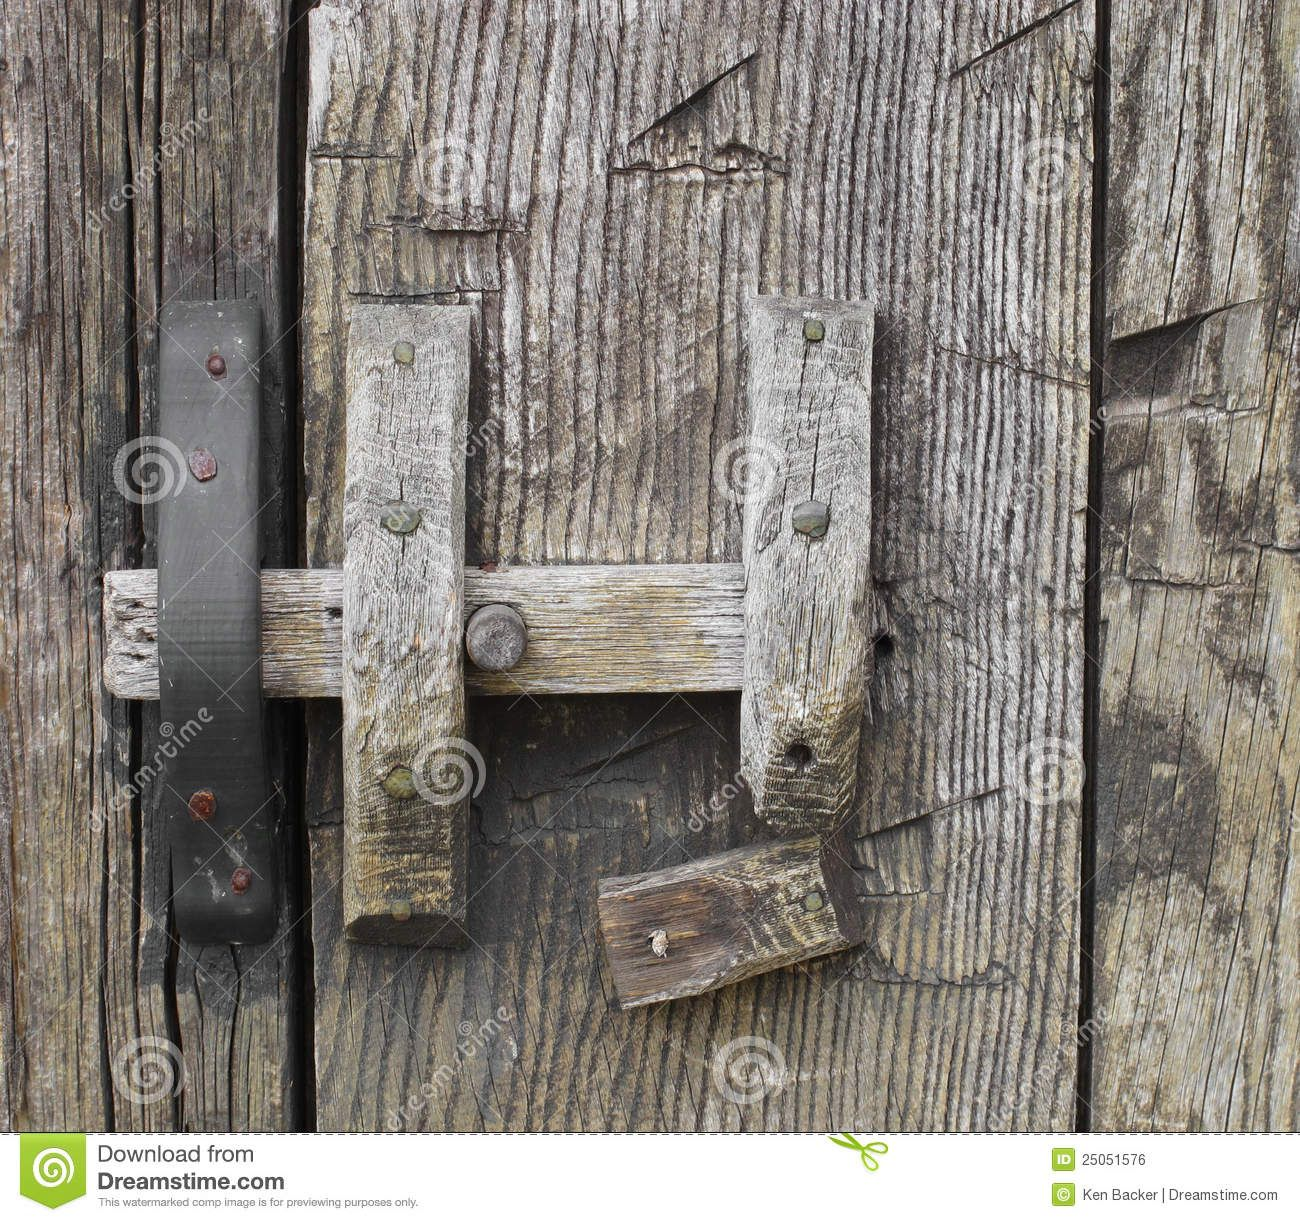 Barn door latches - Rustic Barn Door Wood More Similar Stock Images Of Old Rustic